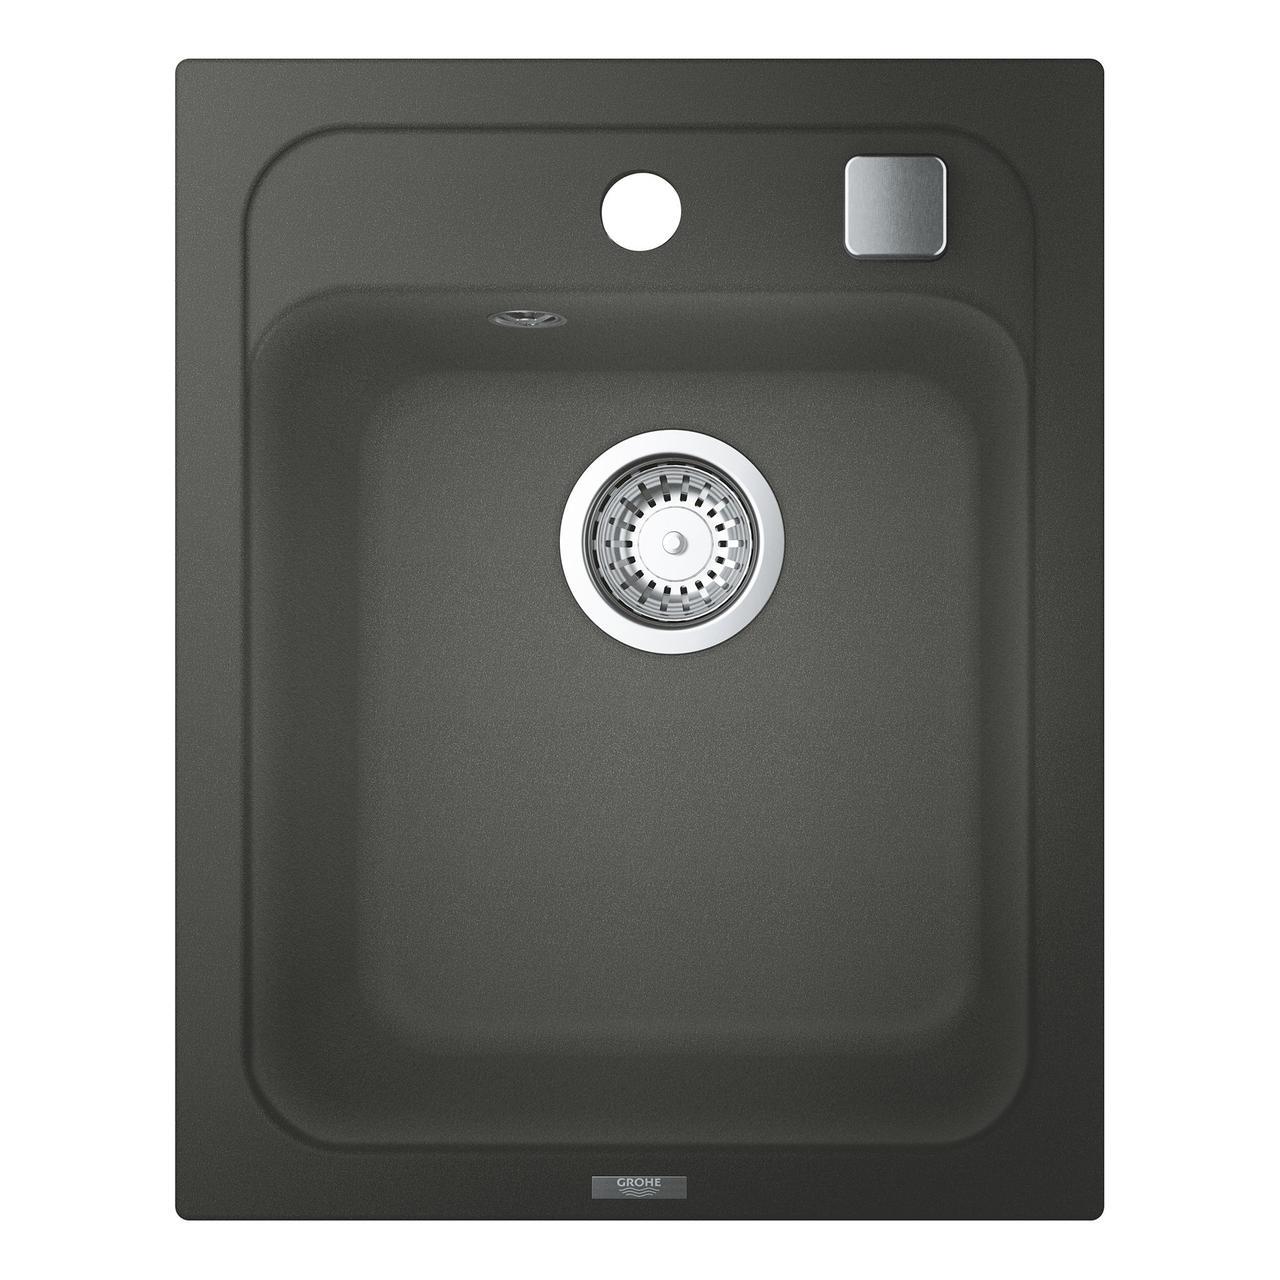 Кухонная мойка гранитная Grohe EX Sink 31650AT0 K700 400 x 500 мм